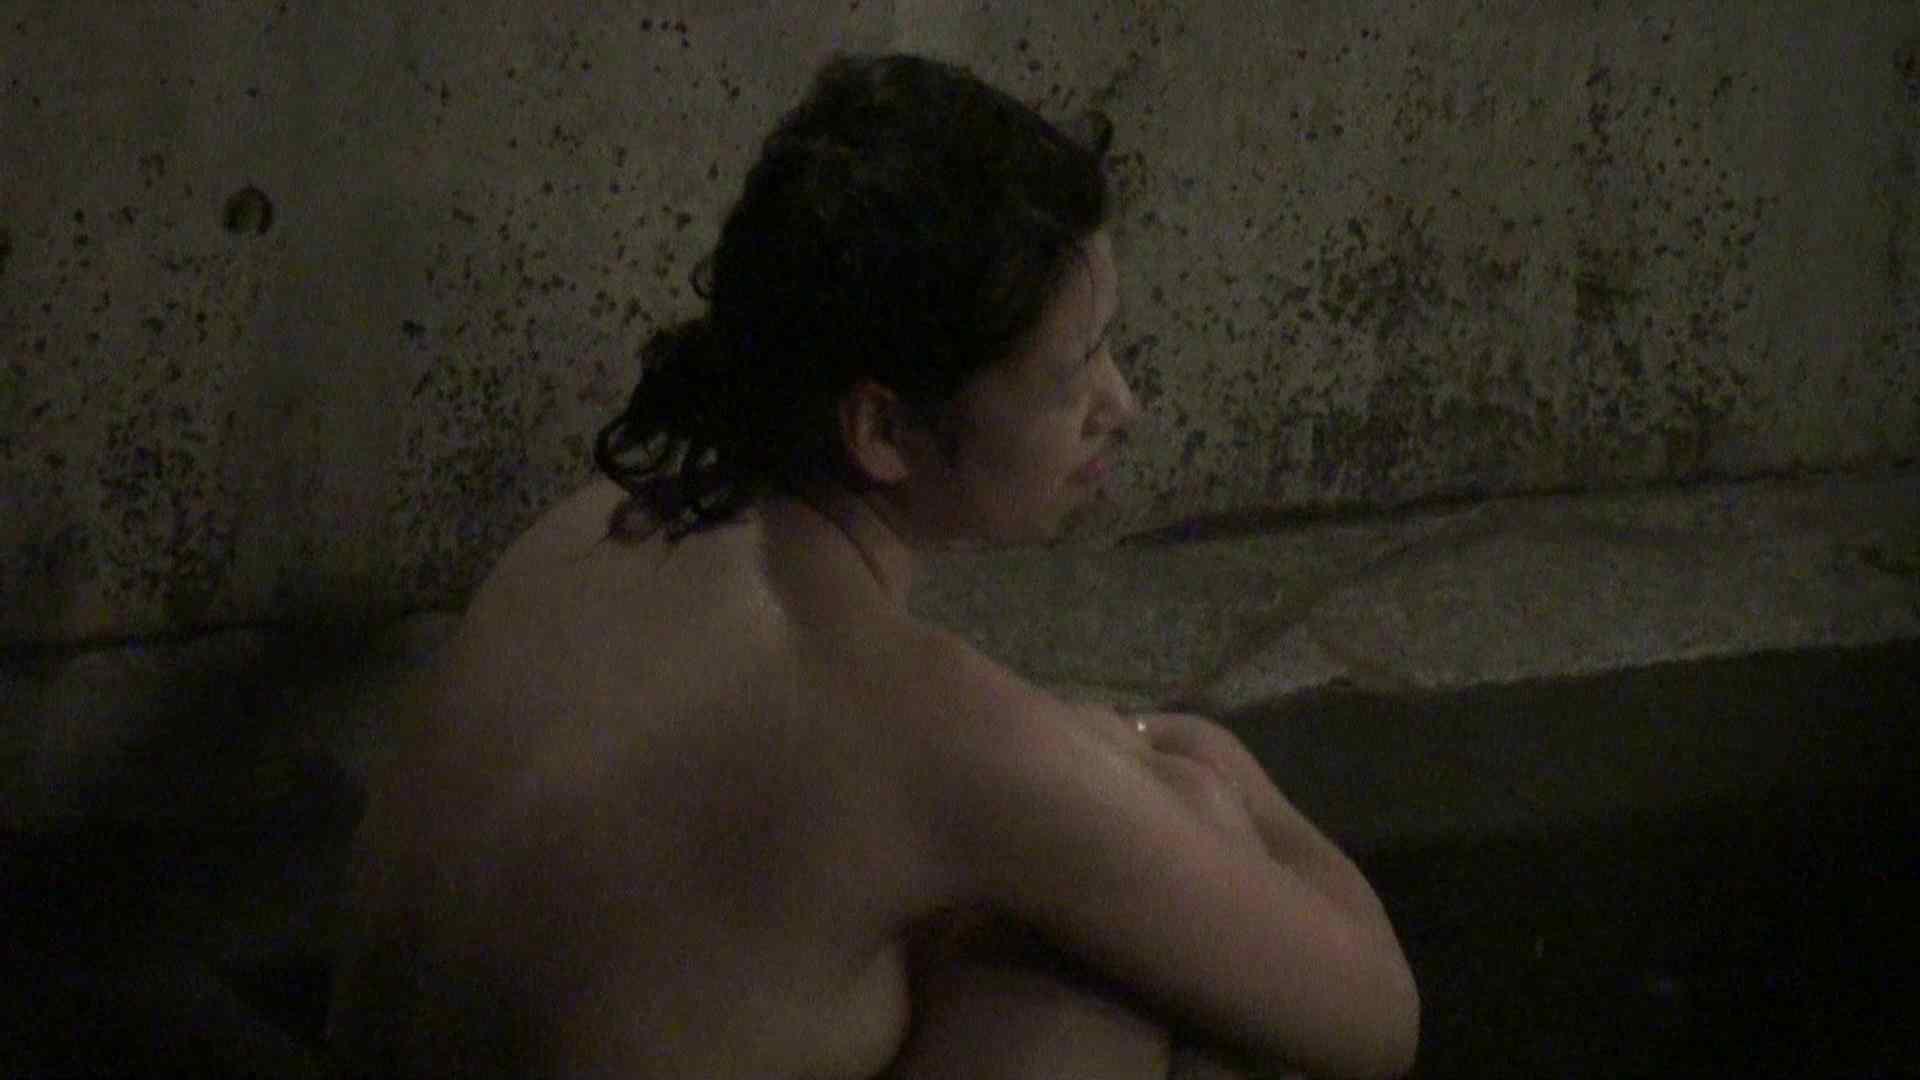 Aquaな露天風呂Vol.342 OLすけべ画像 | 露天  96連発 52